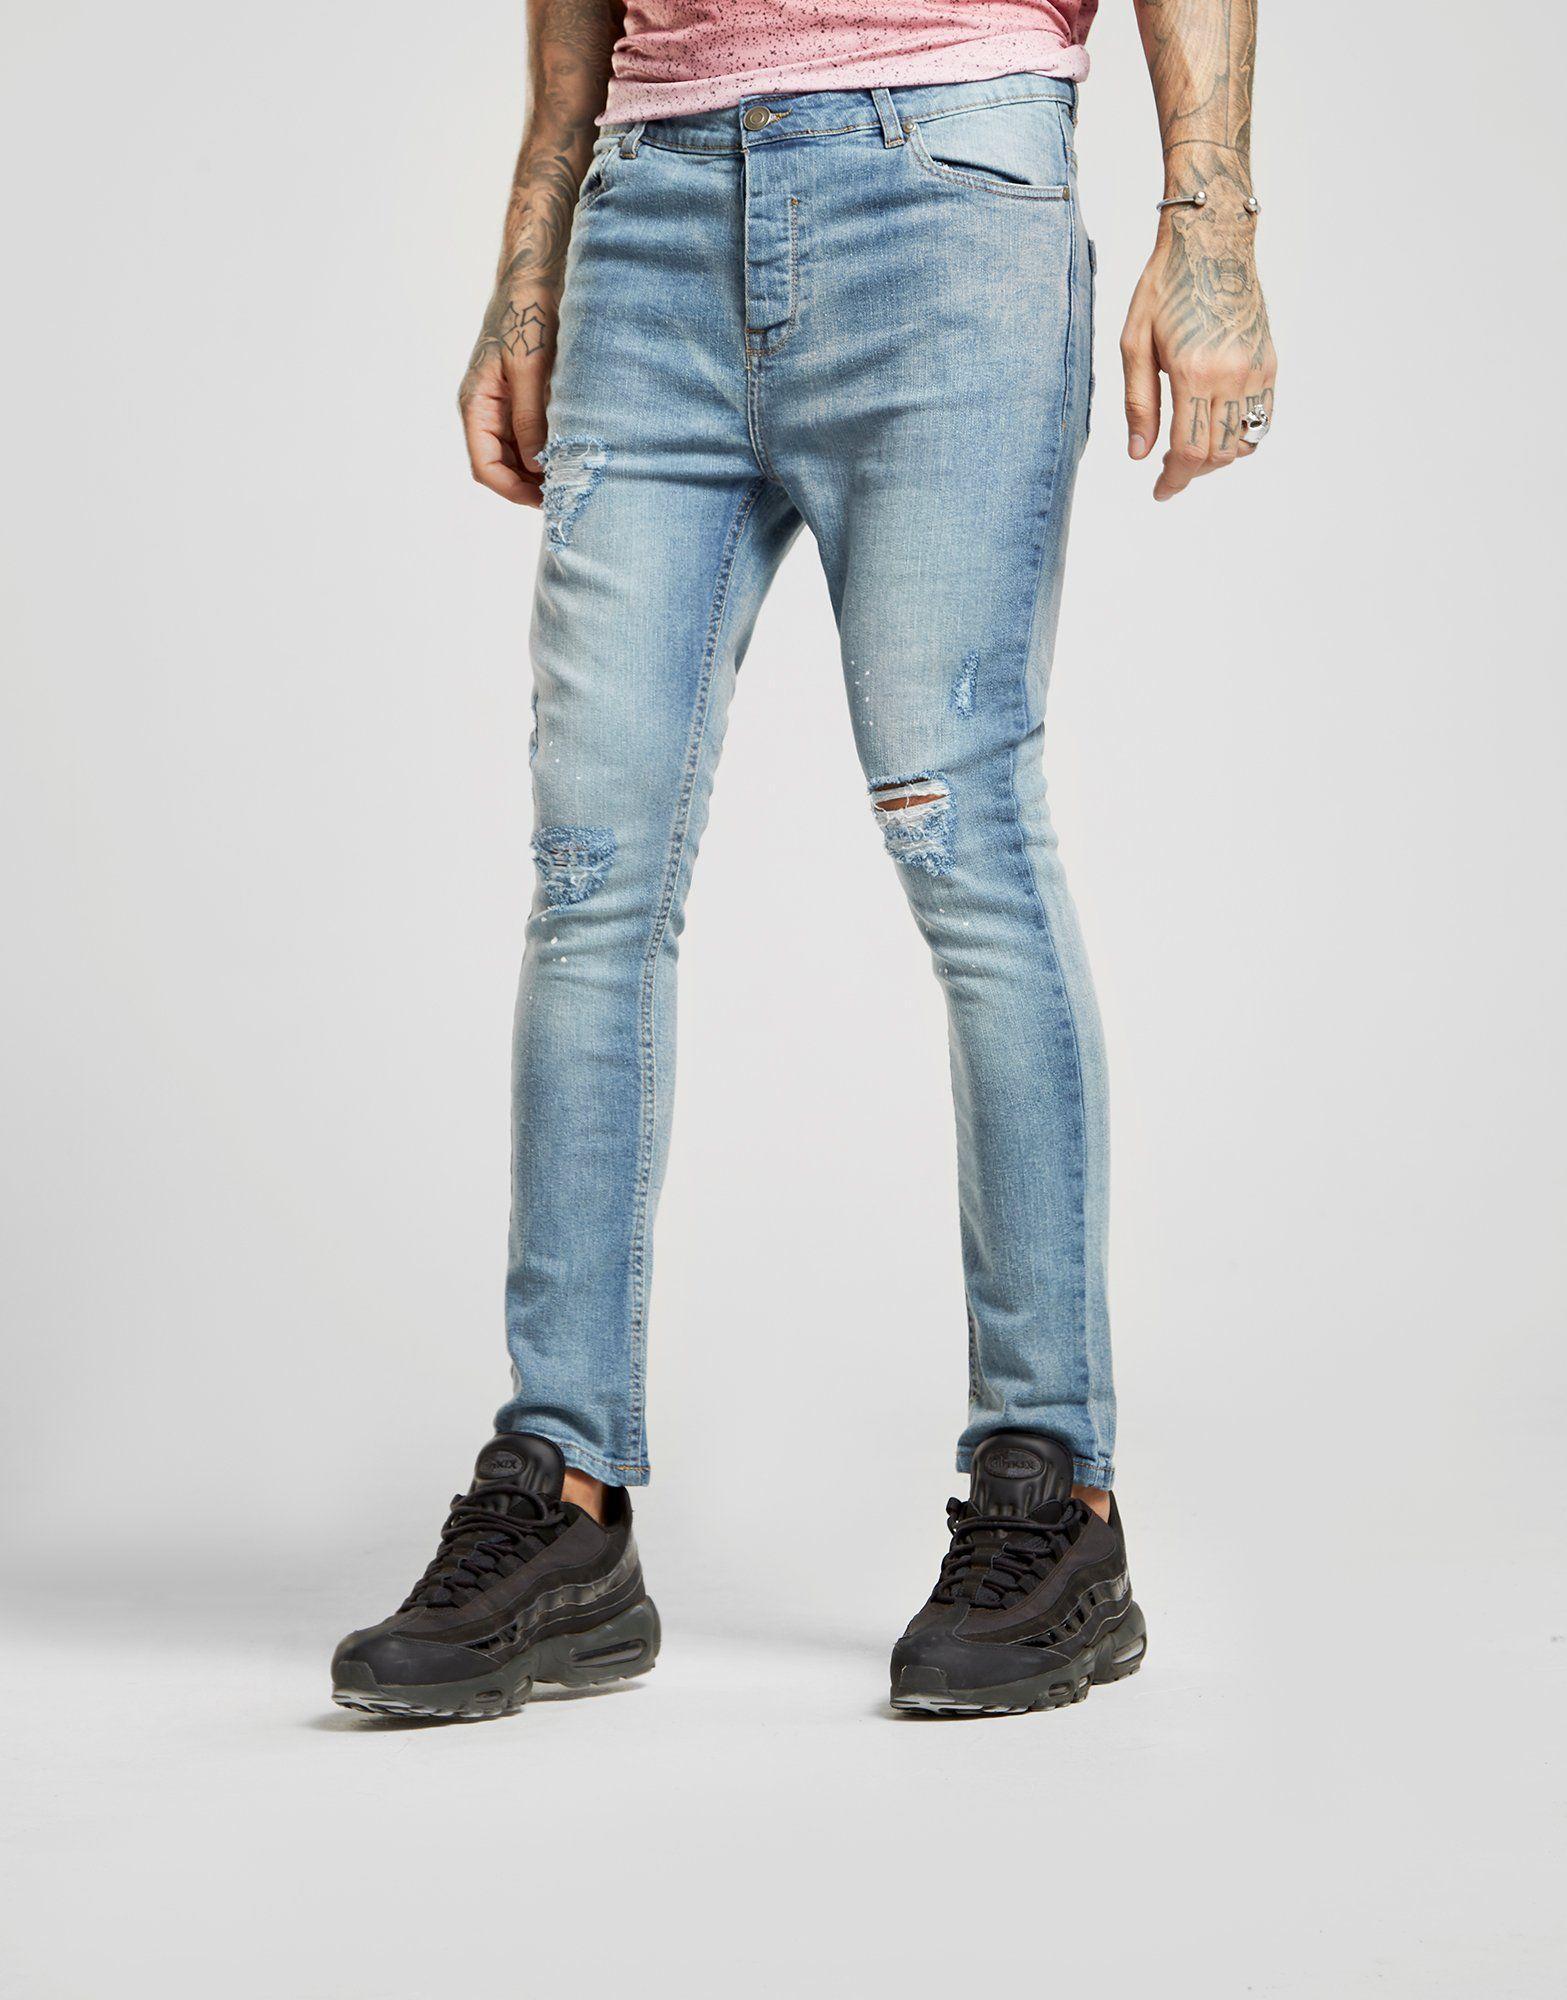 Supply & Demand Jack Flecked Jeans